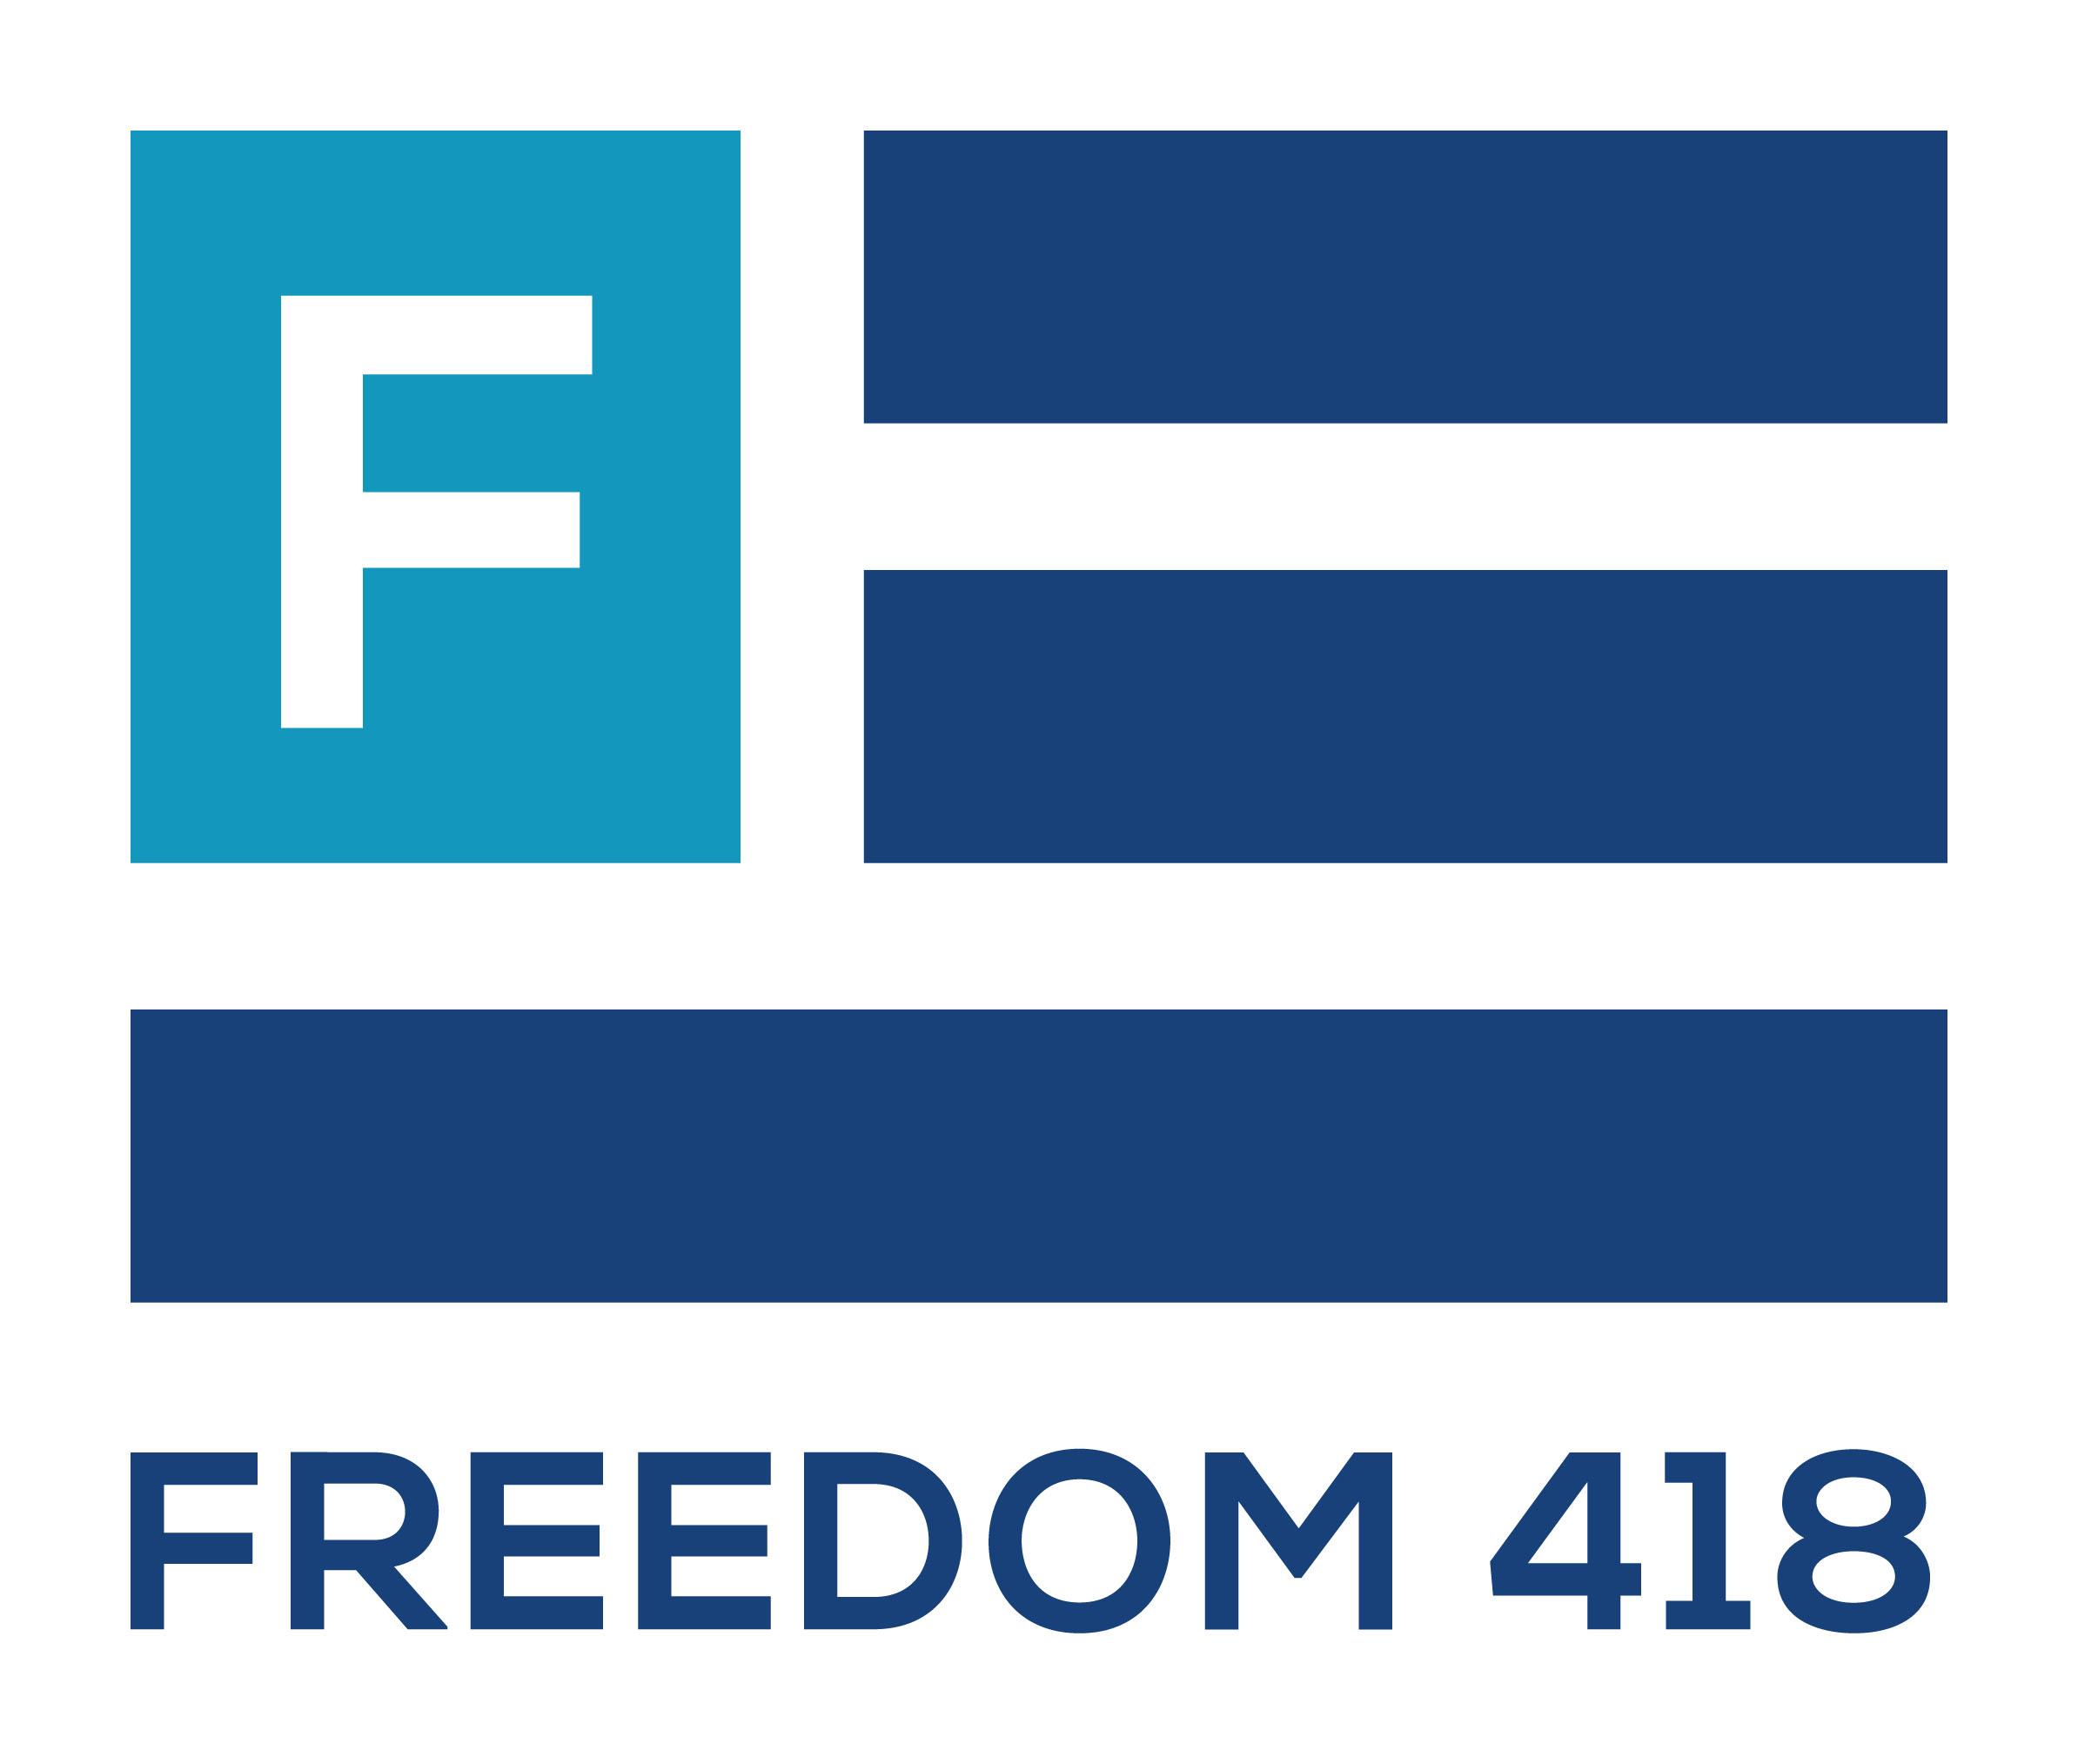 Freedom 418 Org